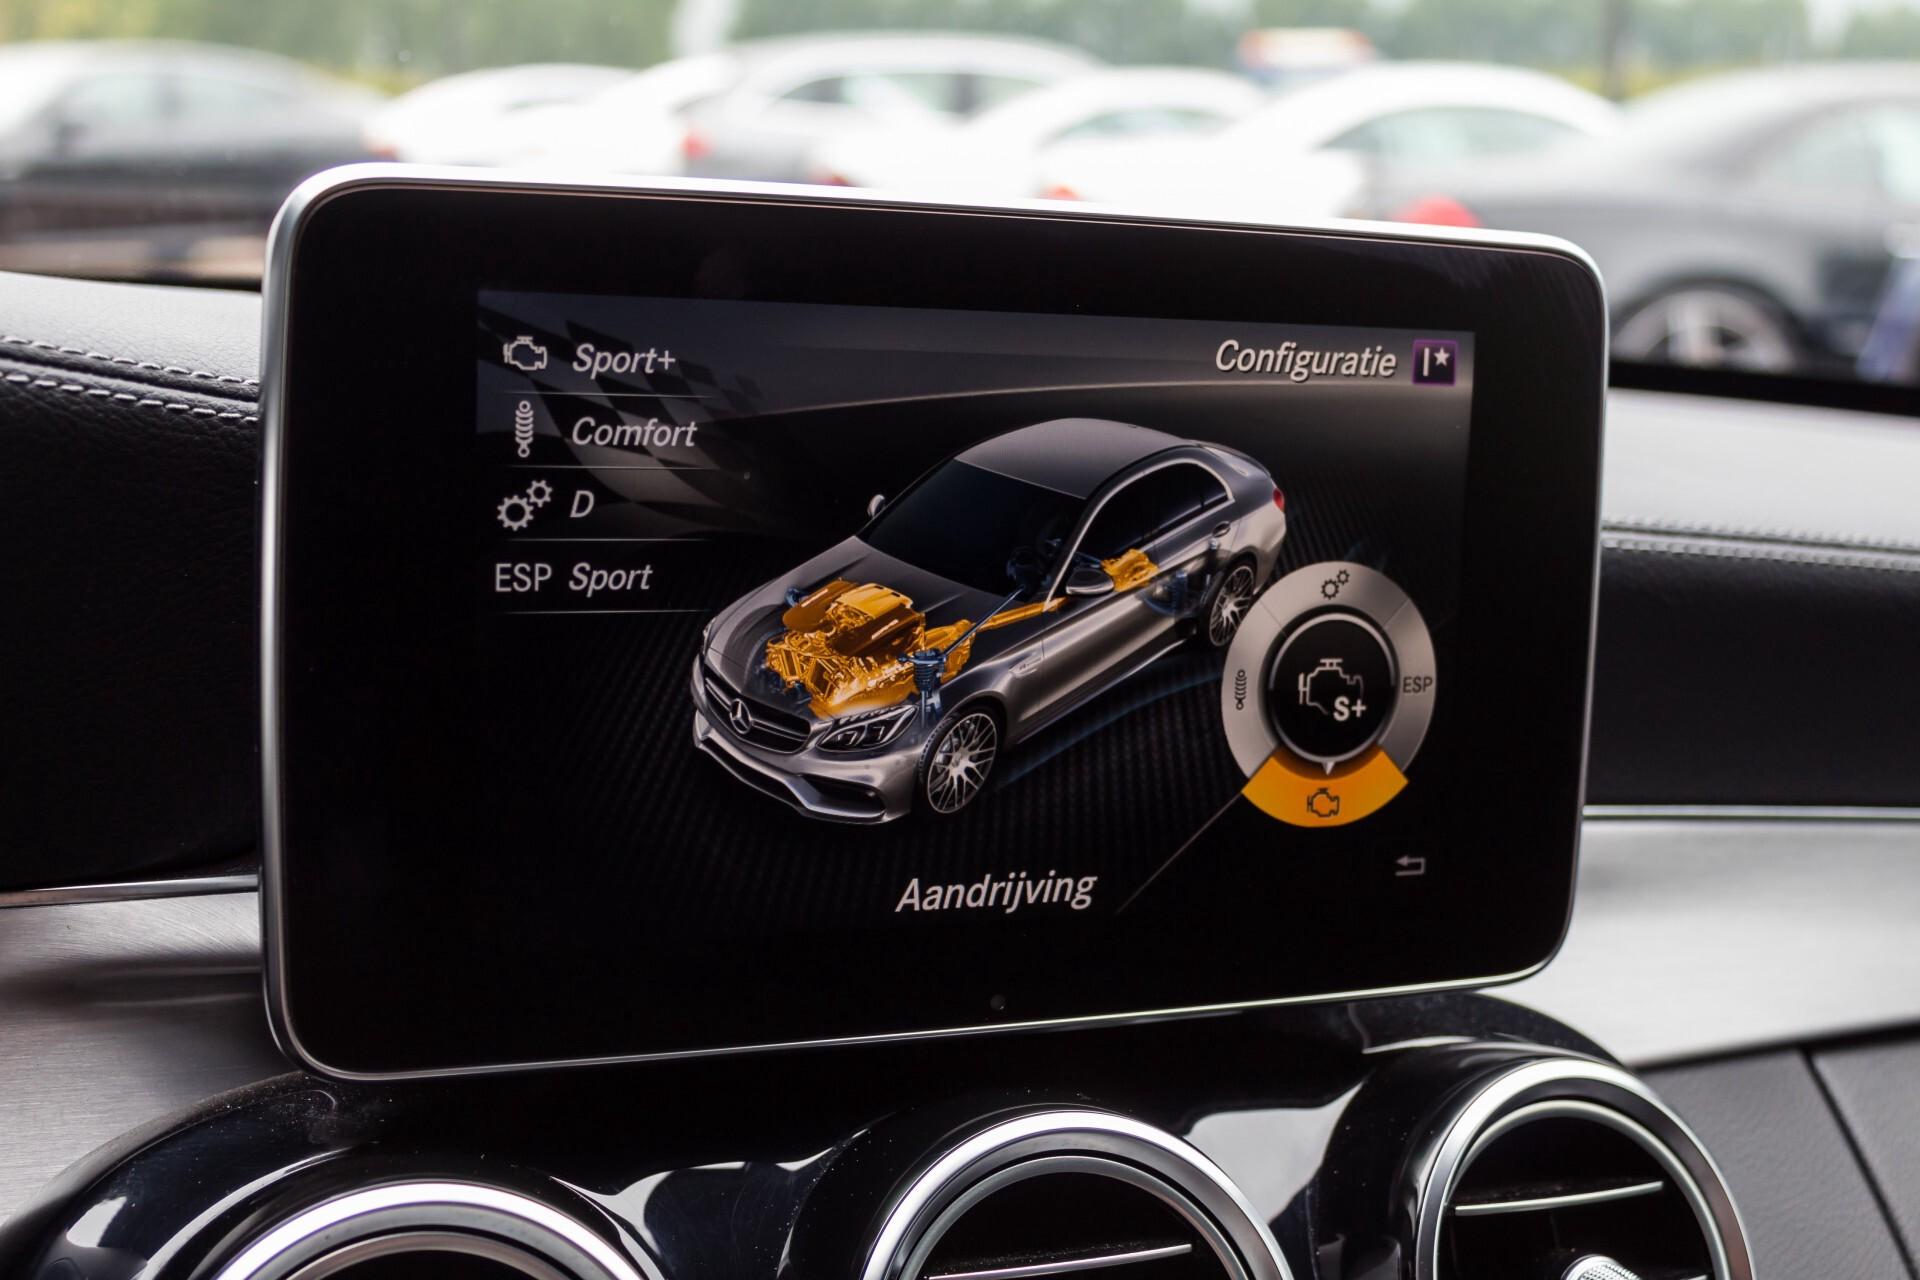 Mercedes-Benz C-Klasse 63 AMG S Panorama/Distronic/Keyless/Comand/Camera/ILS Aut7 Foto 18